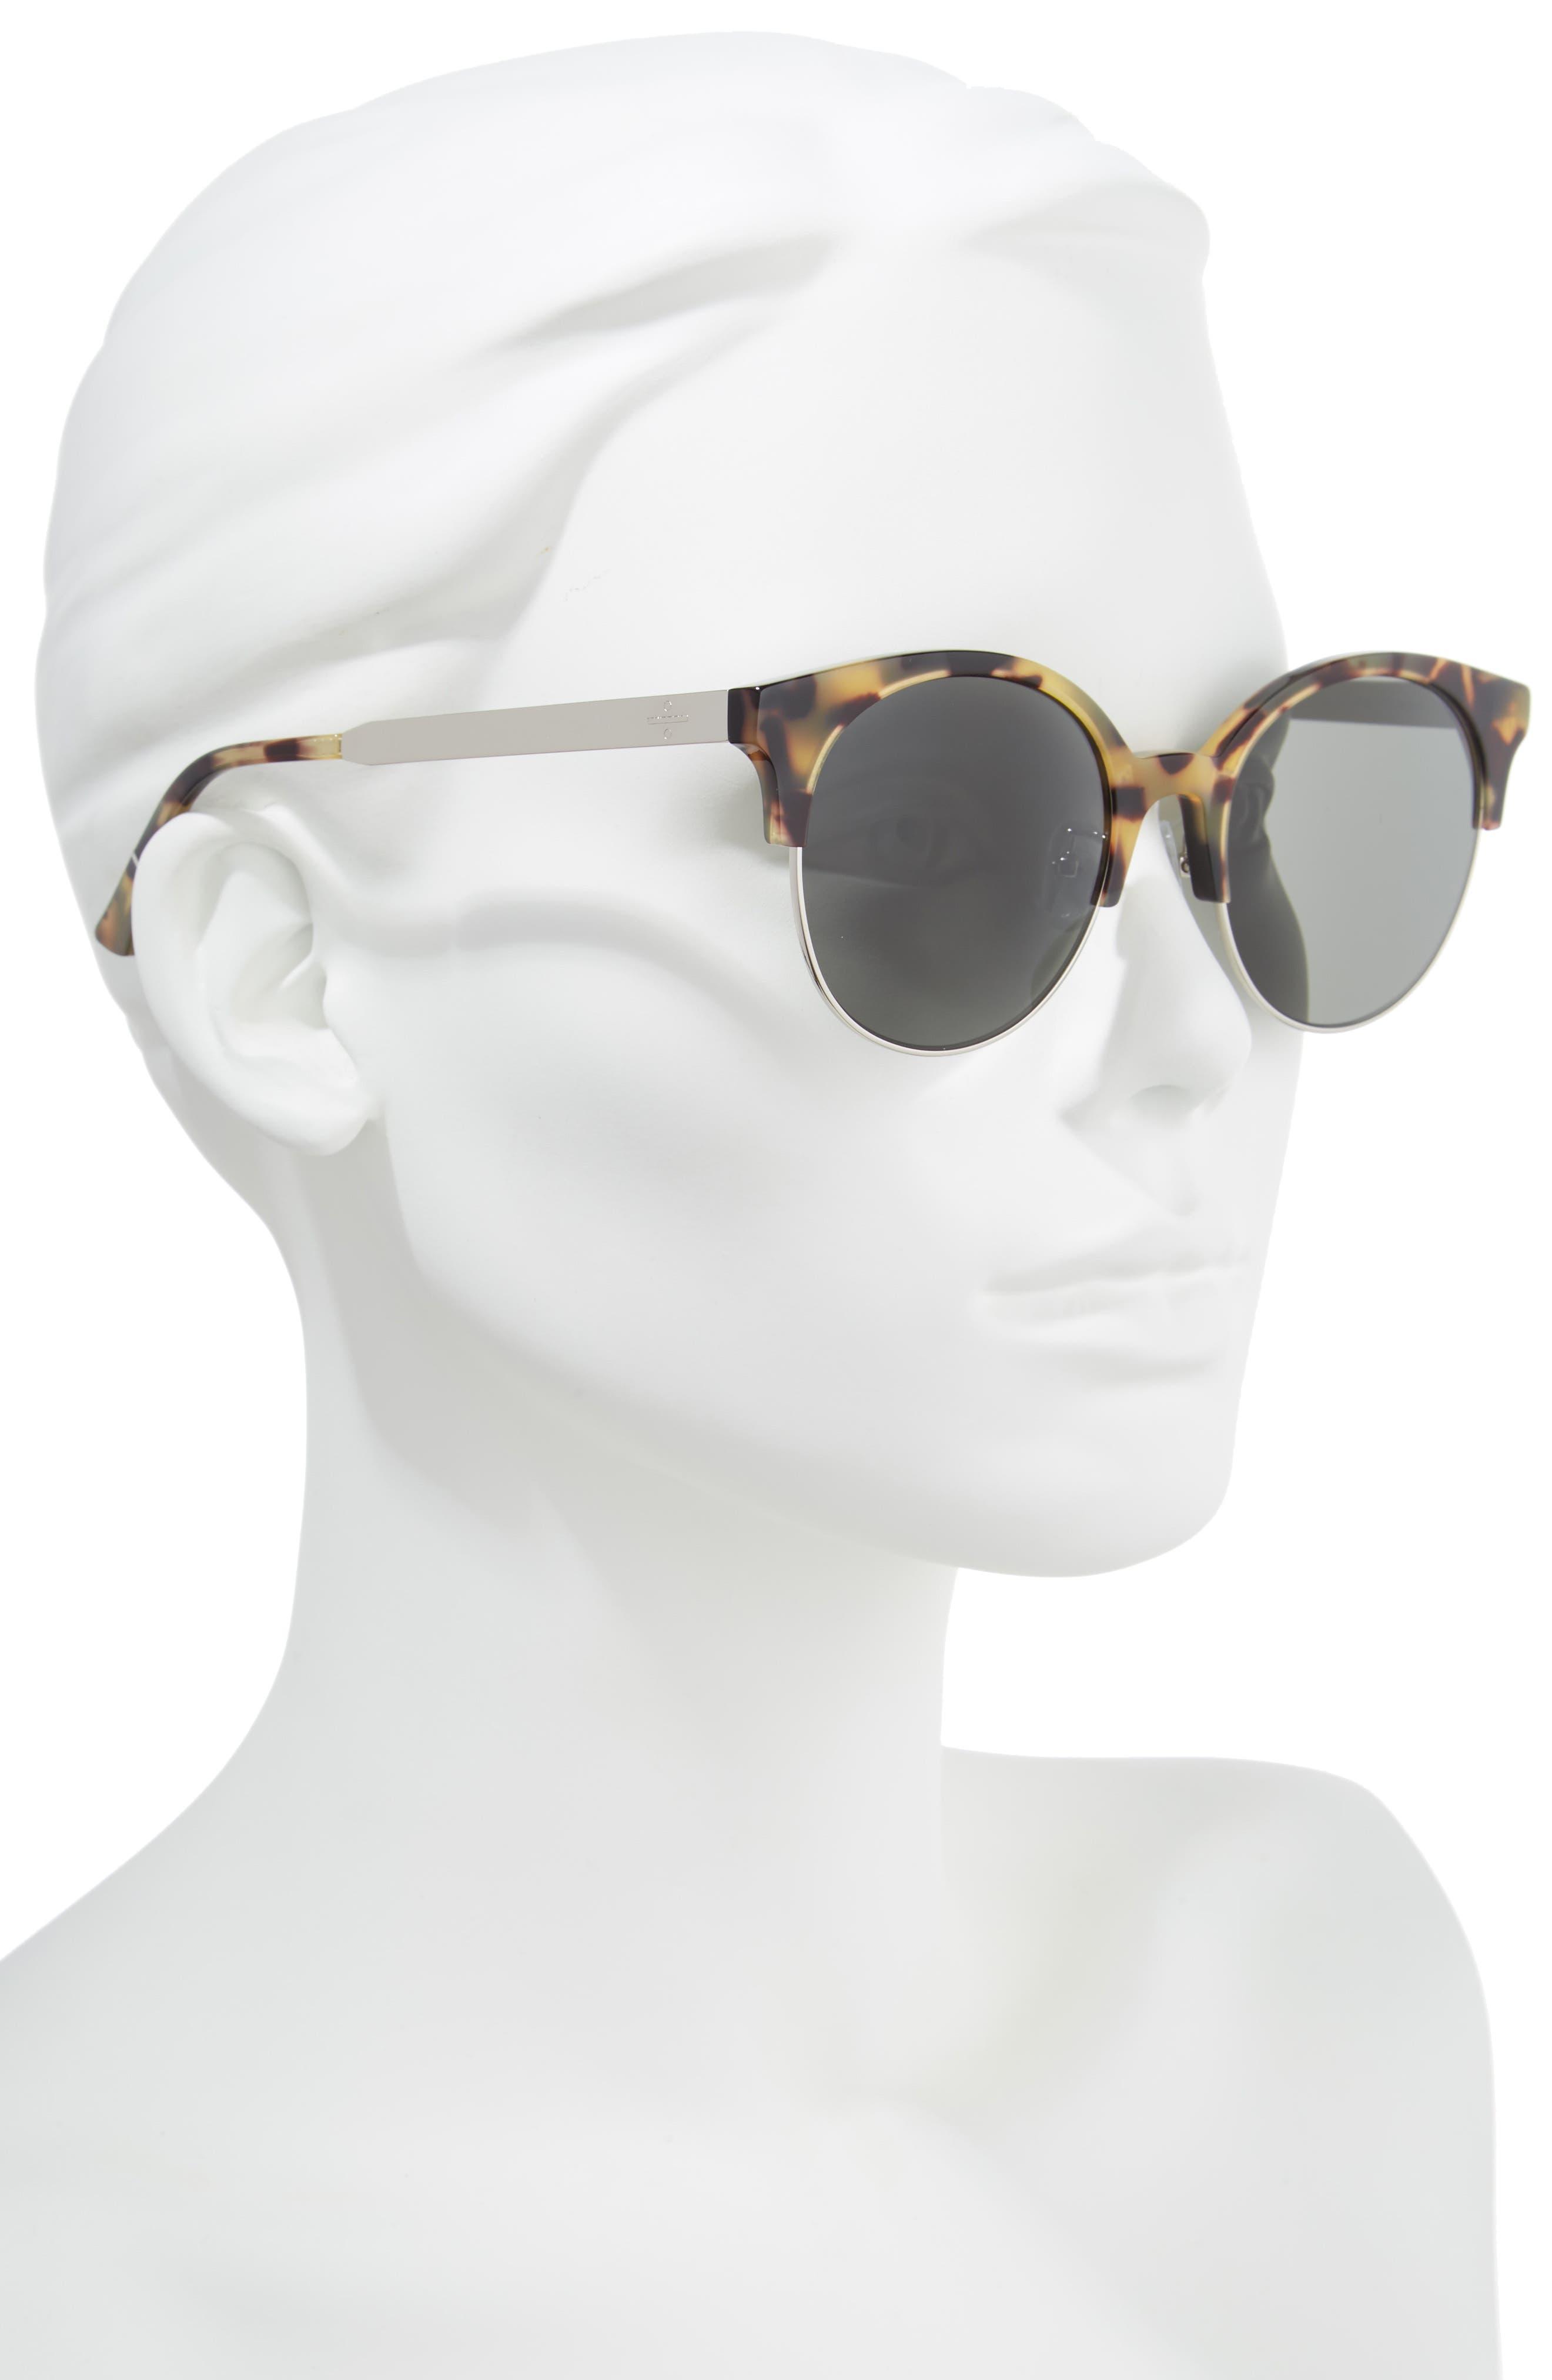 BLANC & ECLARE Venice Round Sunglasses,                             Alternate thumbnail 4, color,